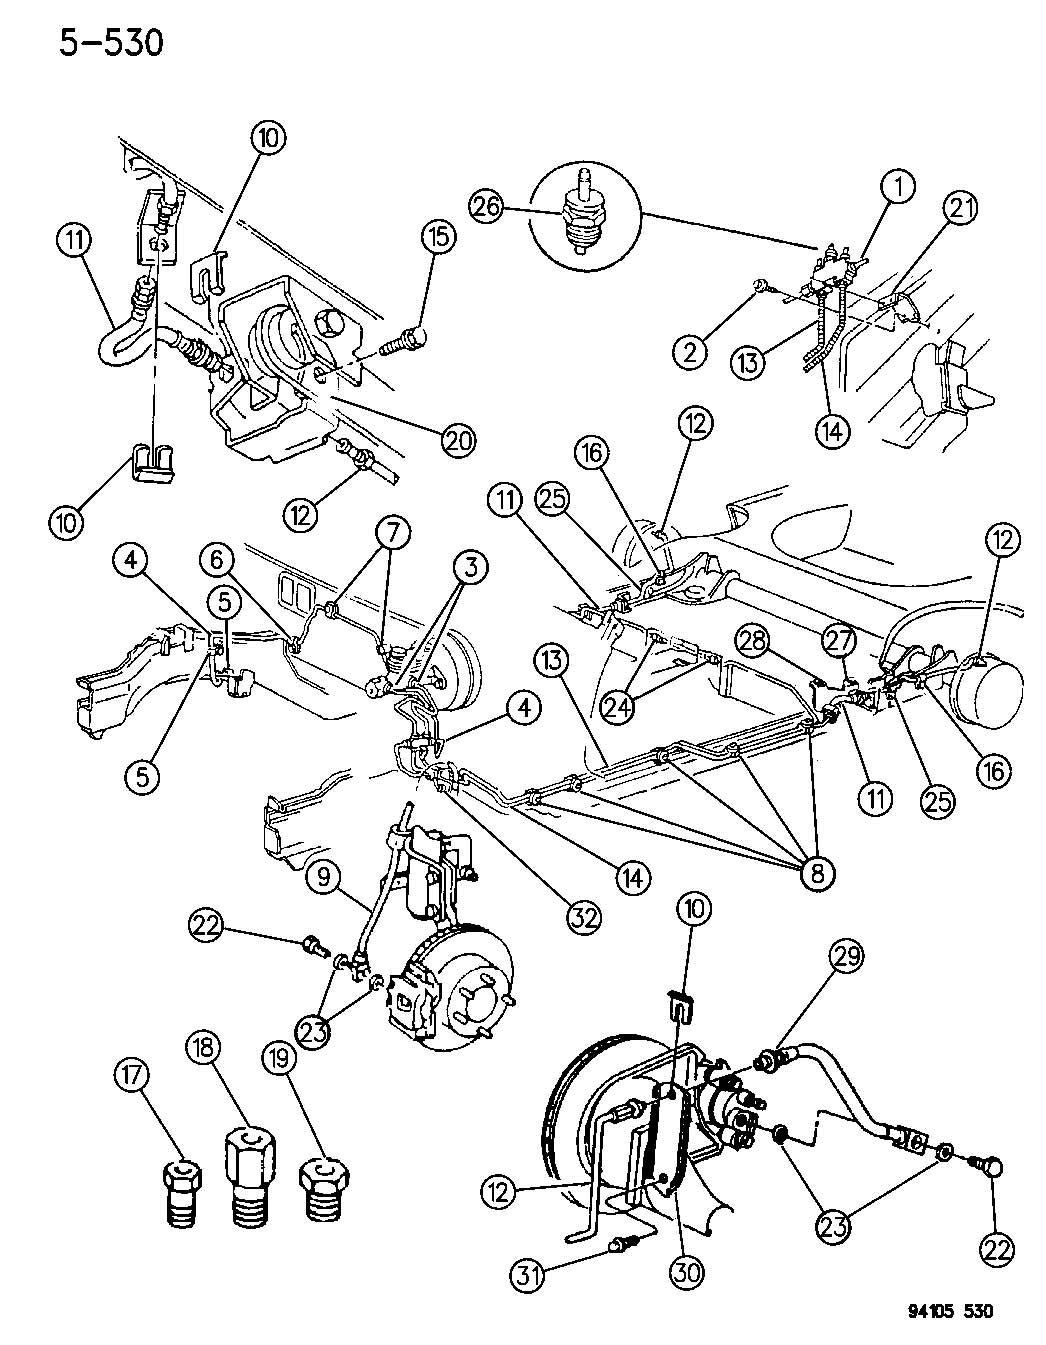 1995 Chrysler Lebaron LINES AND HOSES, BRAKE W/O ANTI-LOCK